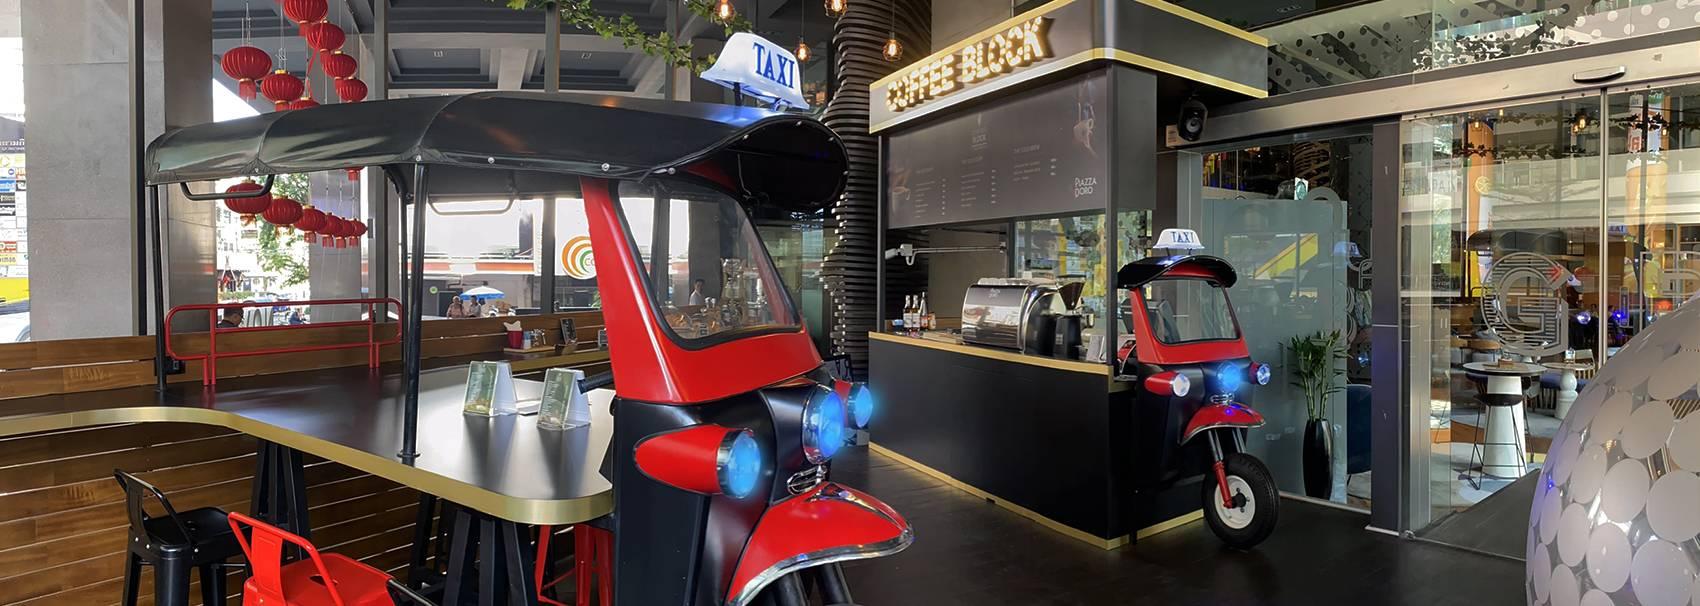 coffee-block-by-gourmet-bar